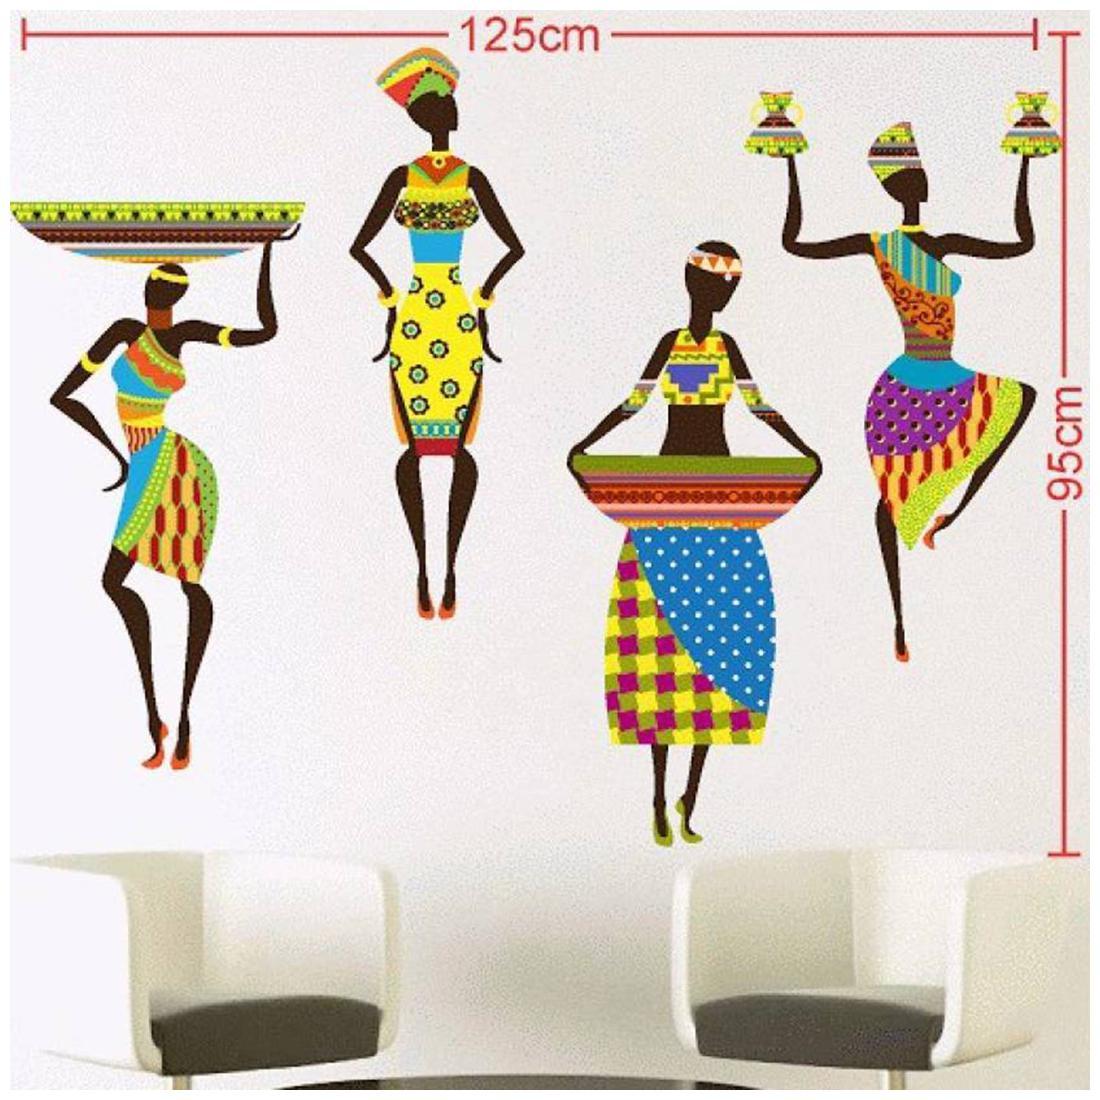 Wall Sticker African Ladys Design PVC Vinyl Home Decor Decal 24 X 27 Inch